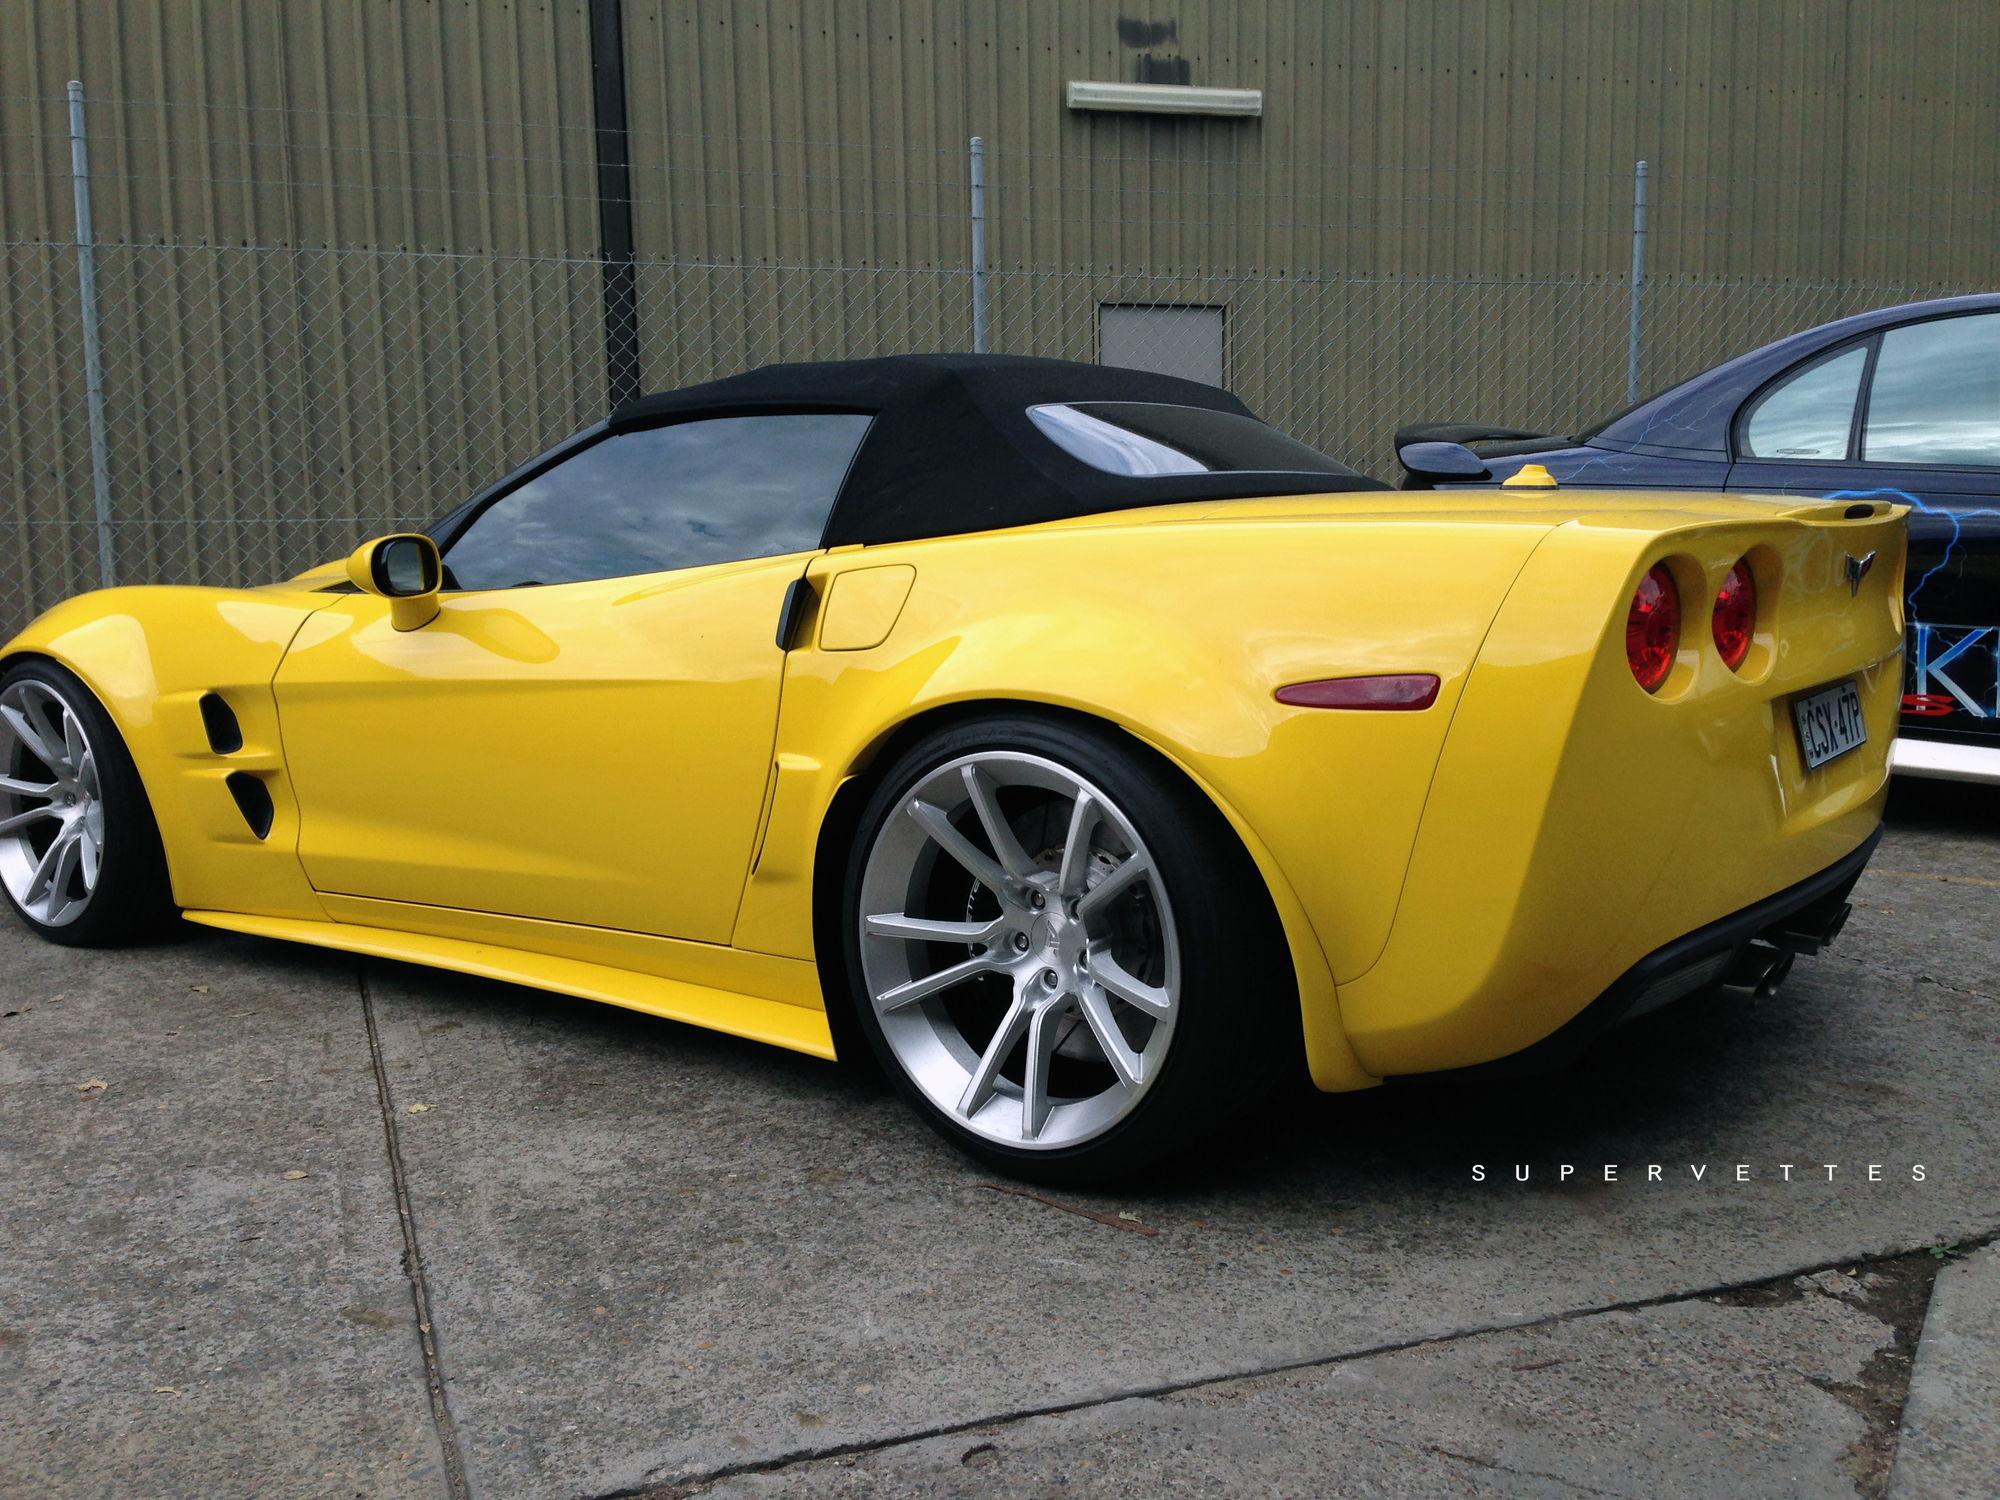 C6 zr1 body kit corvetteforum chevrolet corvette forum discussion